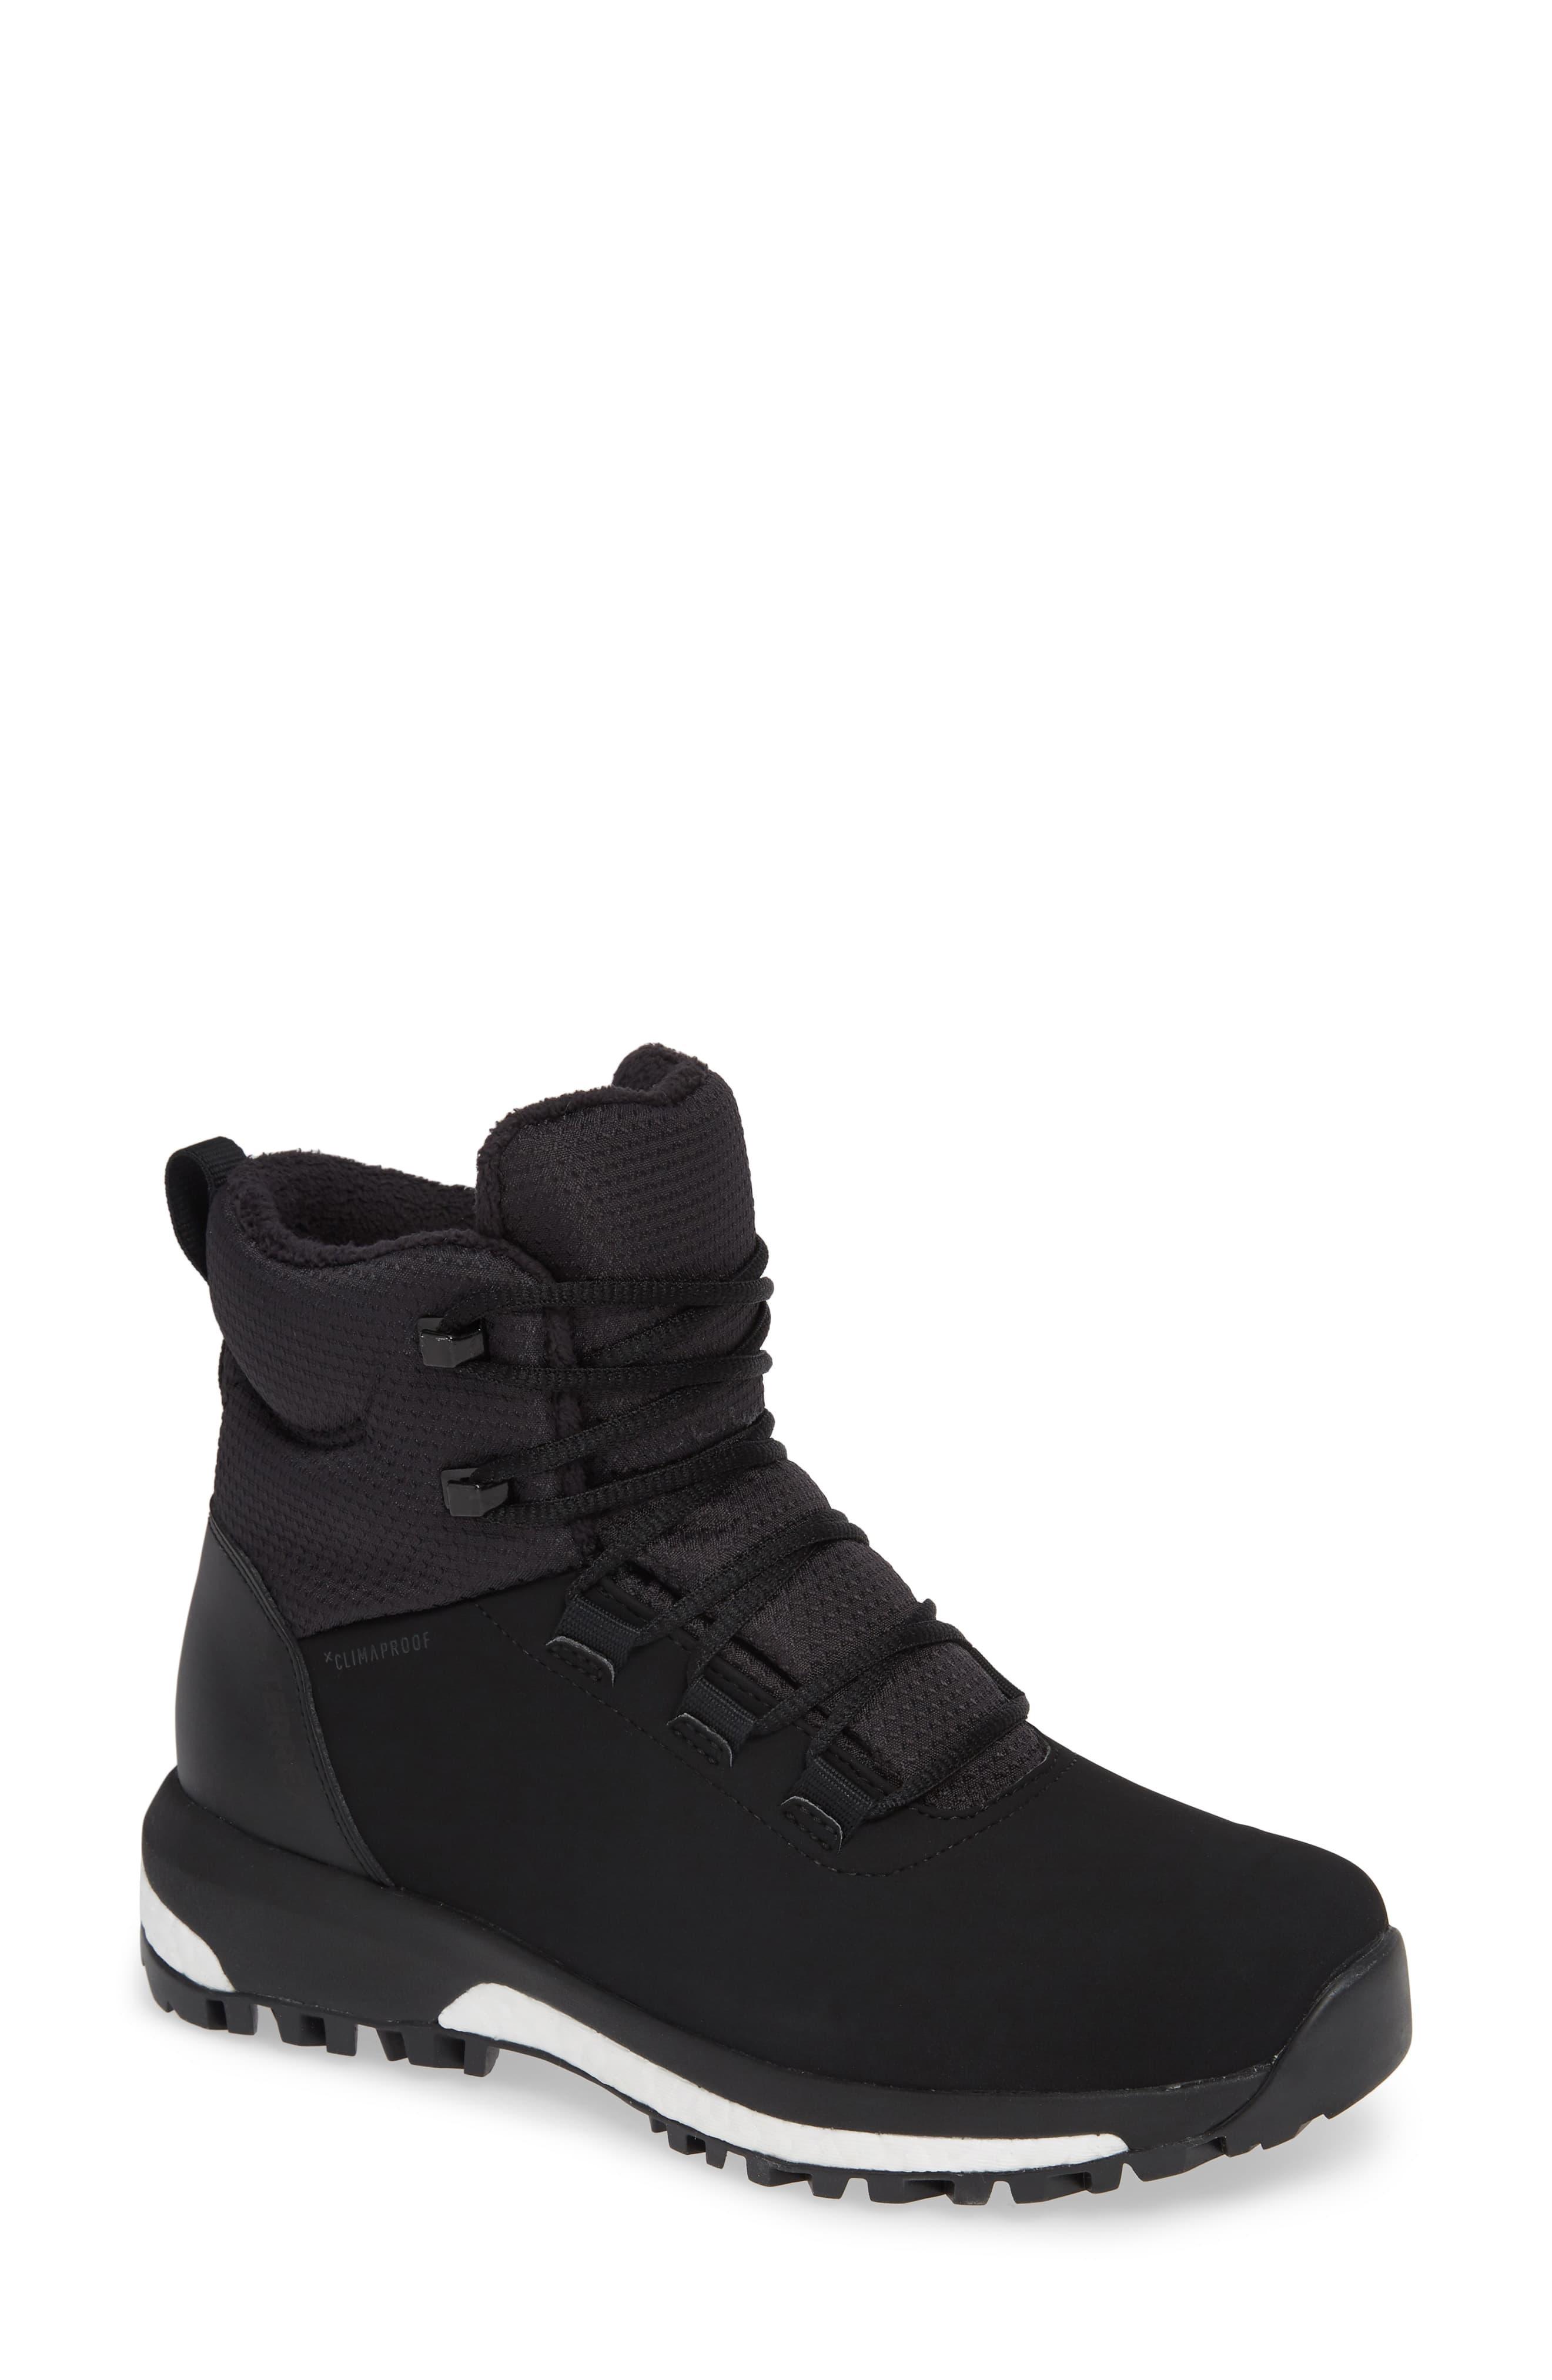 7fe0fcd1d47 Women's Adidas Terrex Pathmaker Waterproof Hiking Boot, Size 11 M ...